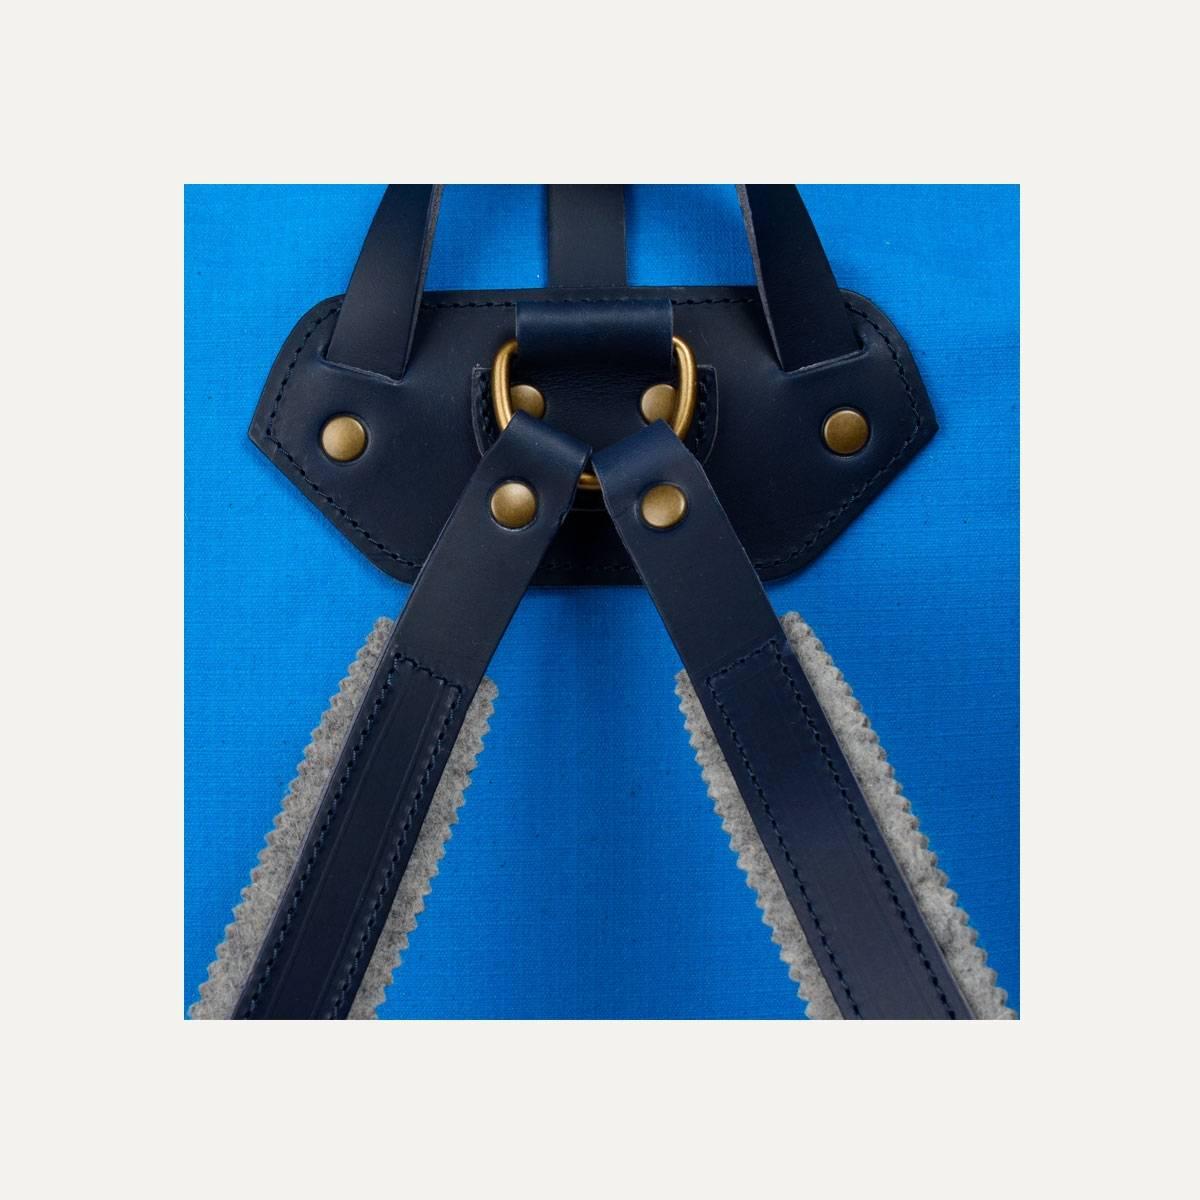 Jamy Backpack - Regentex Blue (image n°6)